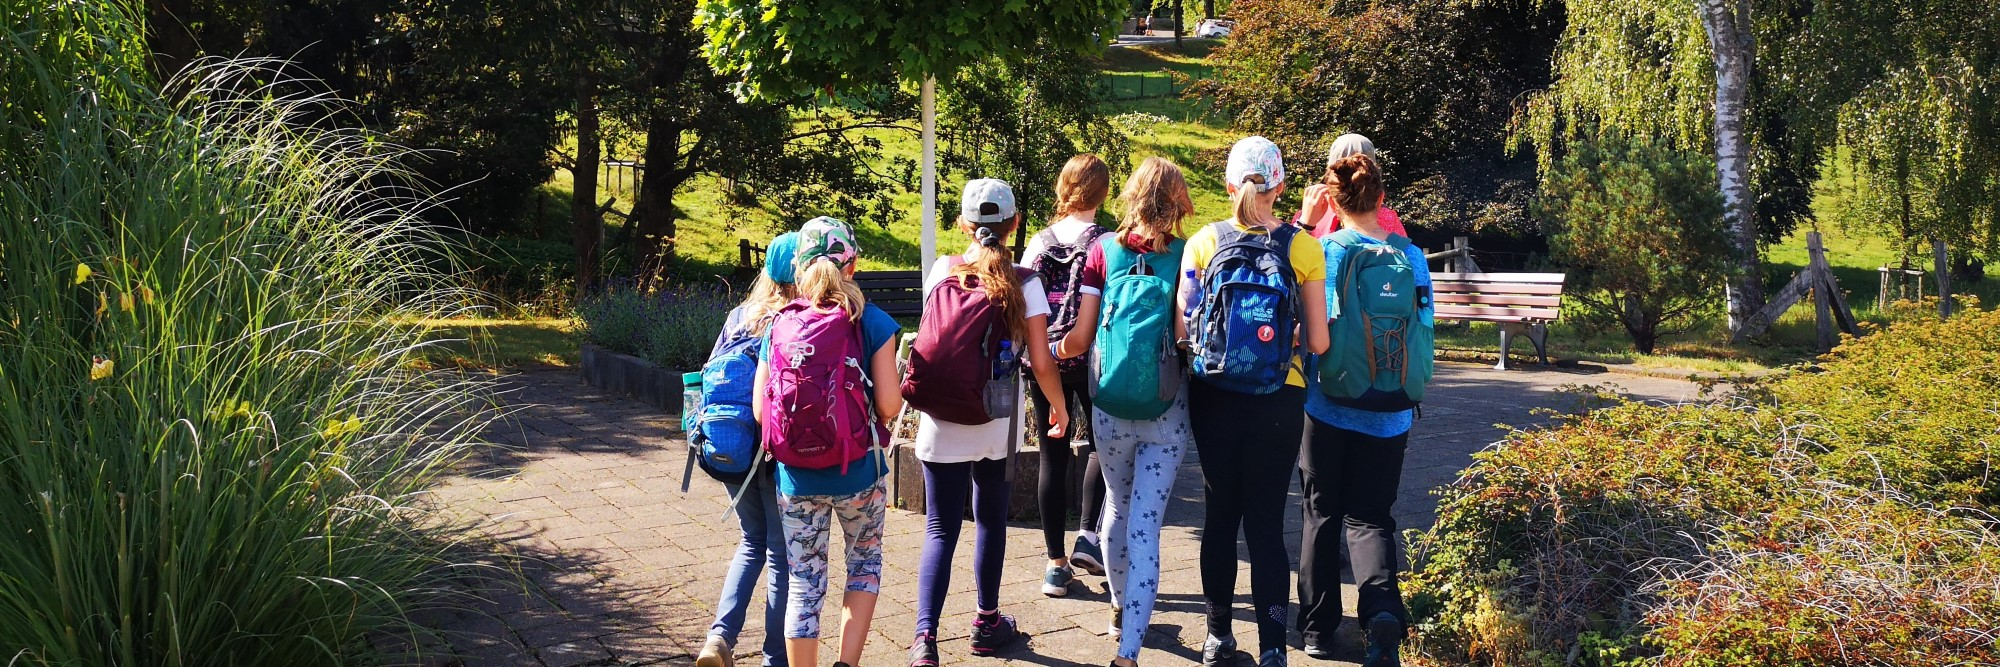 Wandergruppe im Park